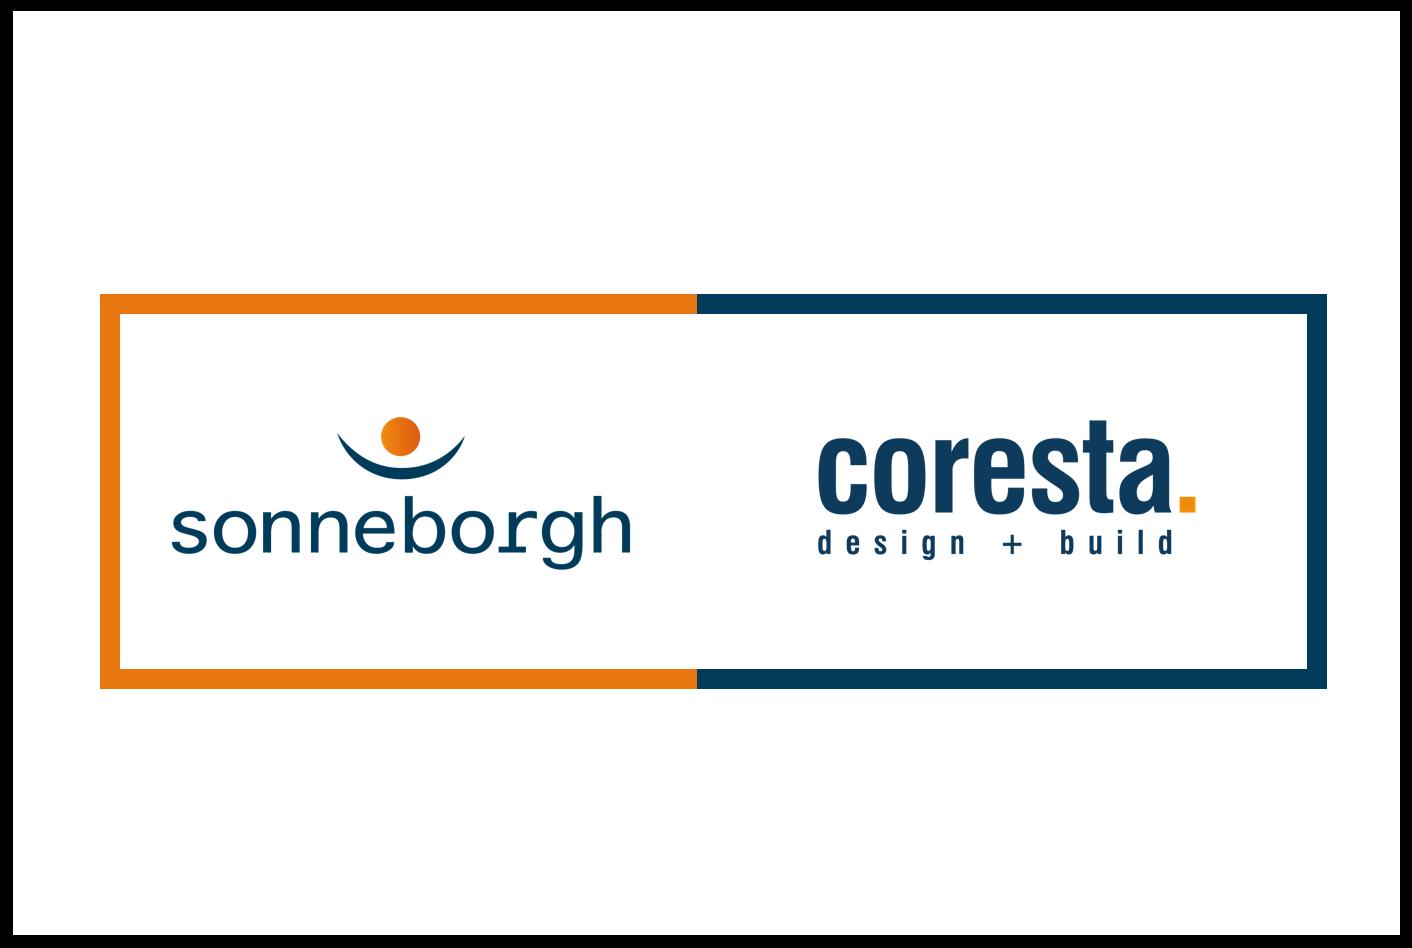 Sonneborgh & Coresta